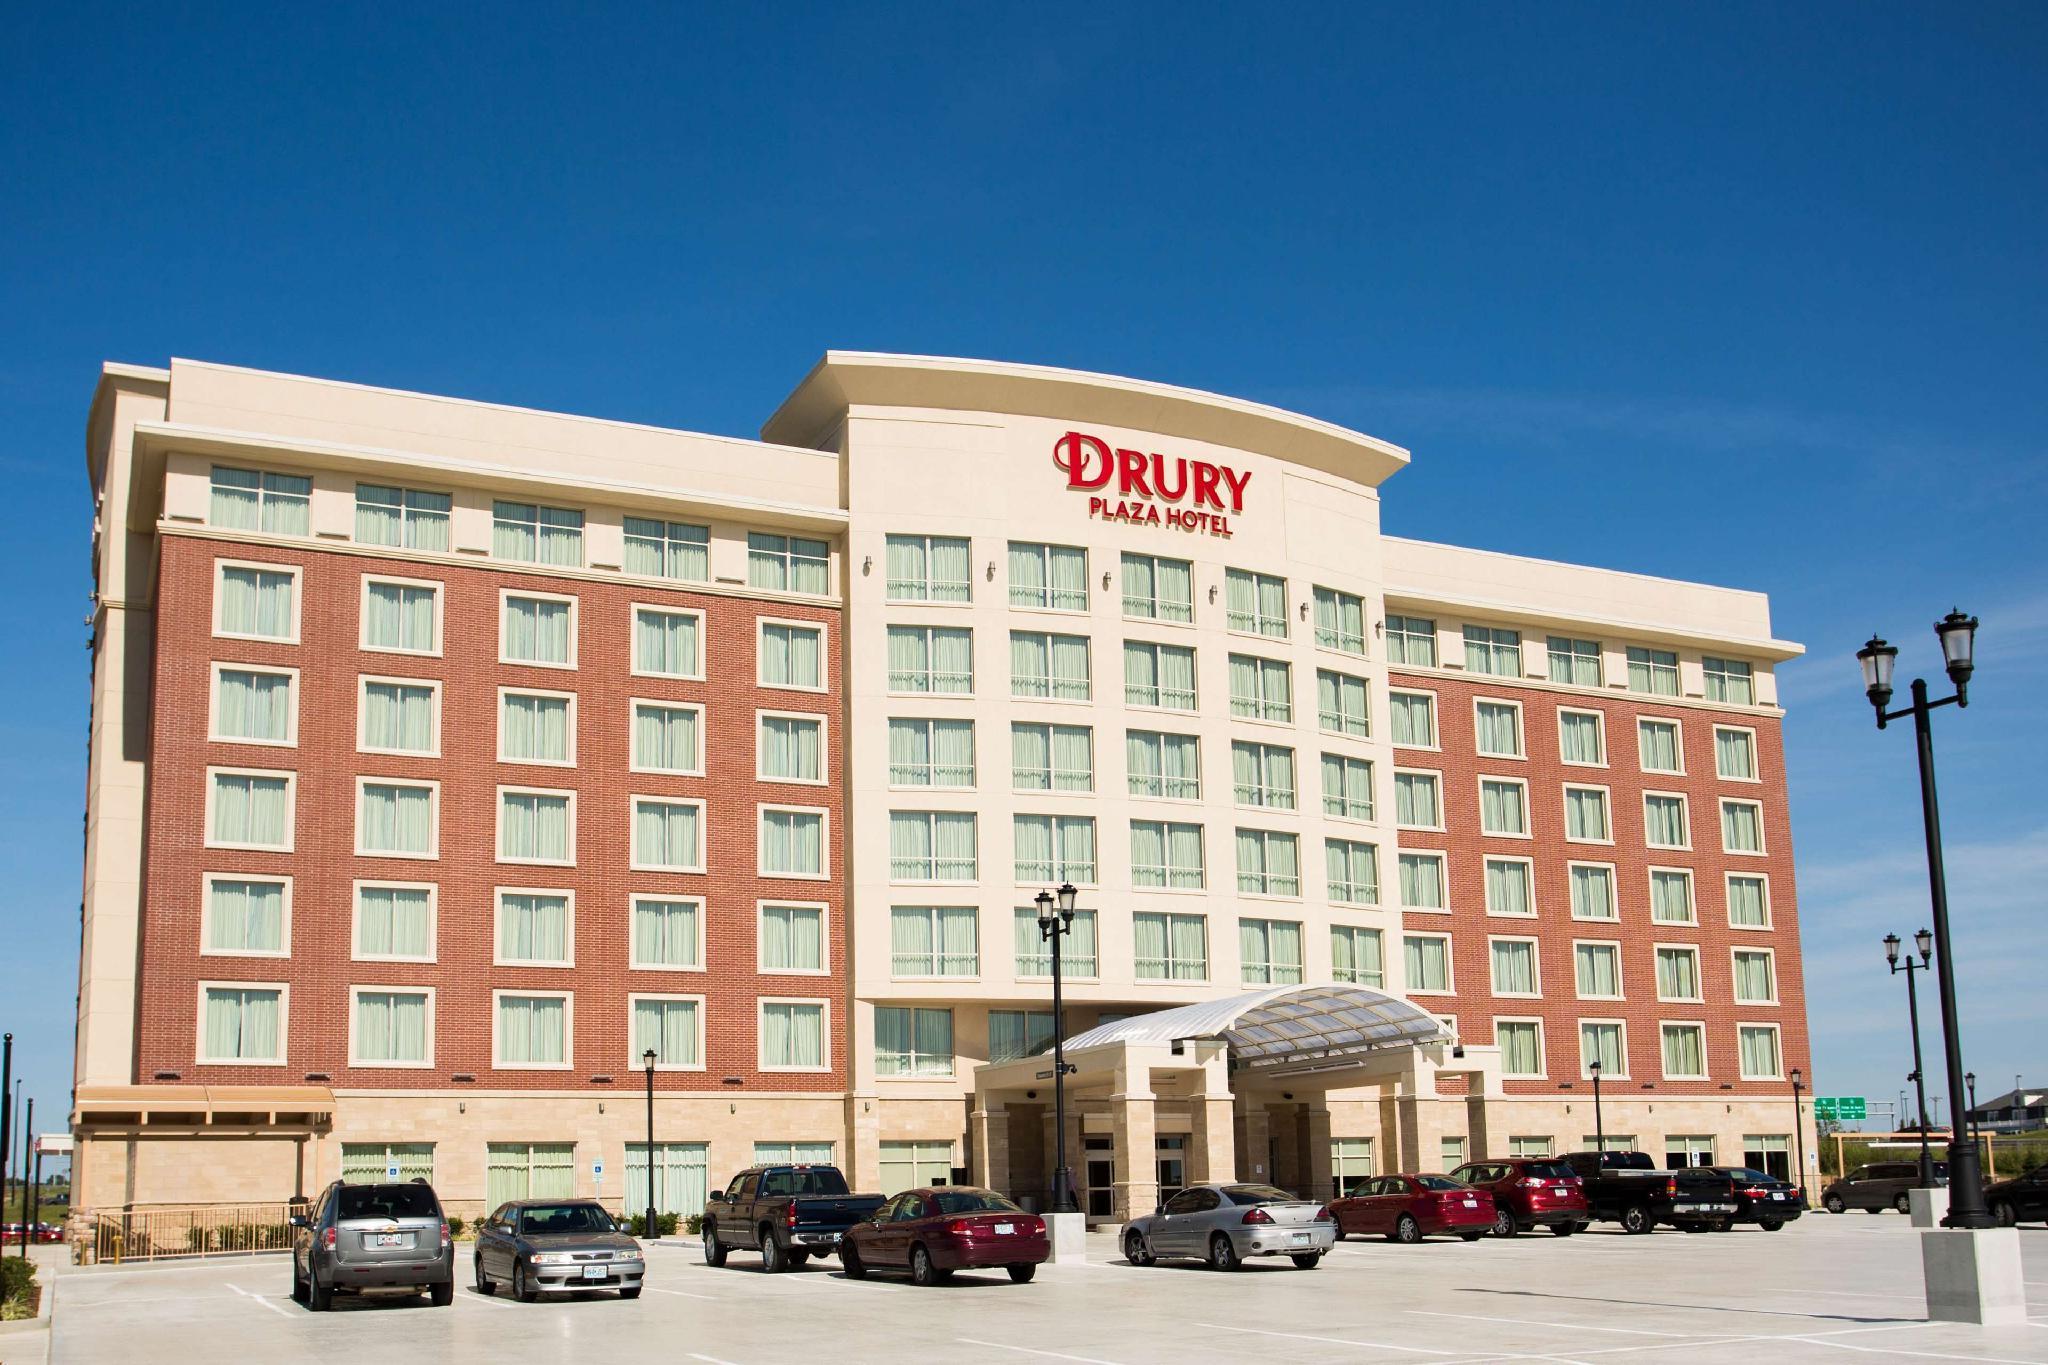 Drury Plaza Hotel St. Louis St. Charles